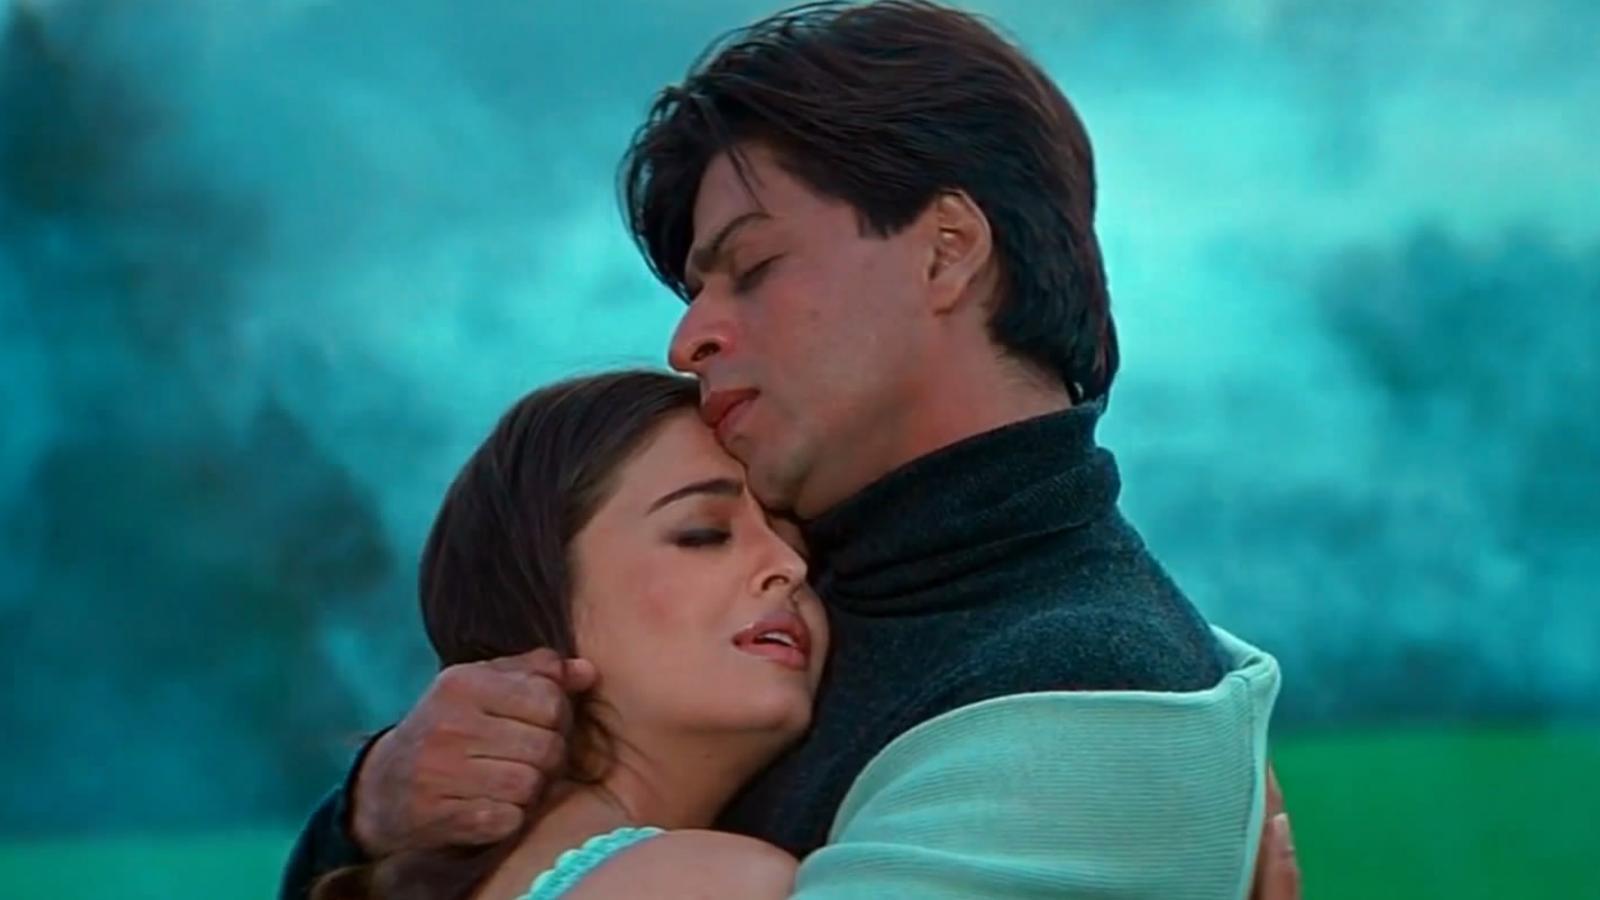 THE LOVE THAT LIVES ON FOREVER MOHABBATEIN SRKUniverse